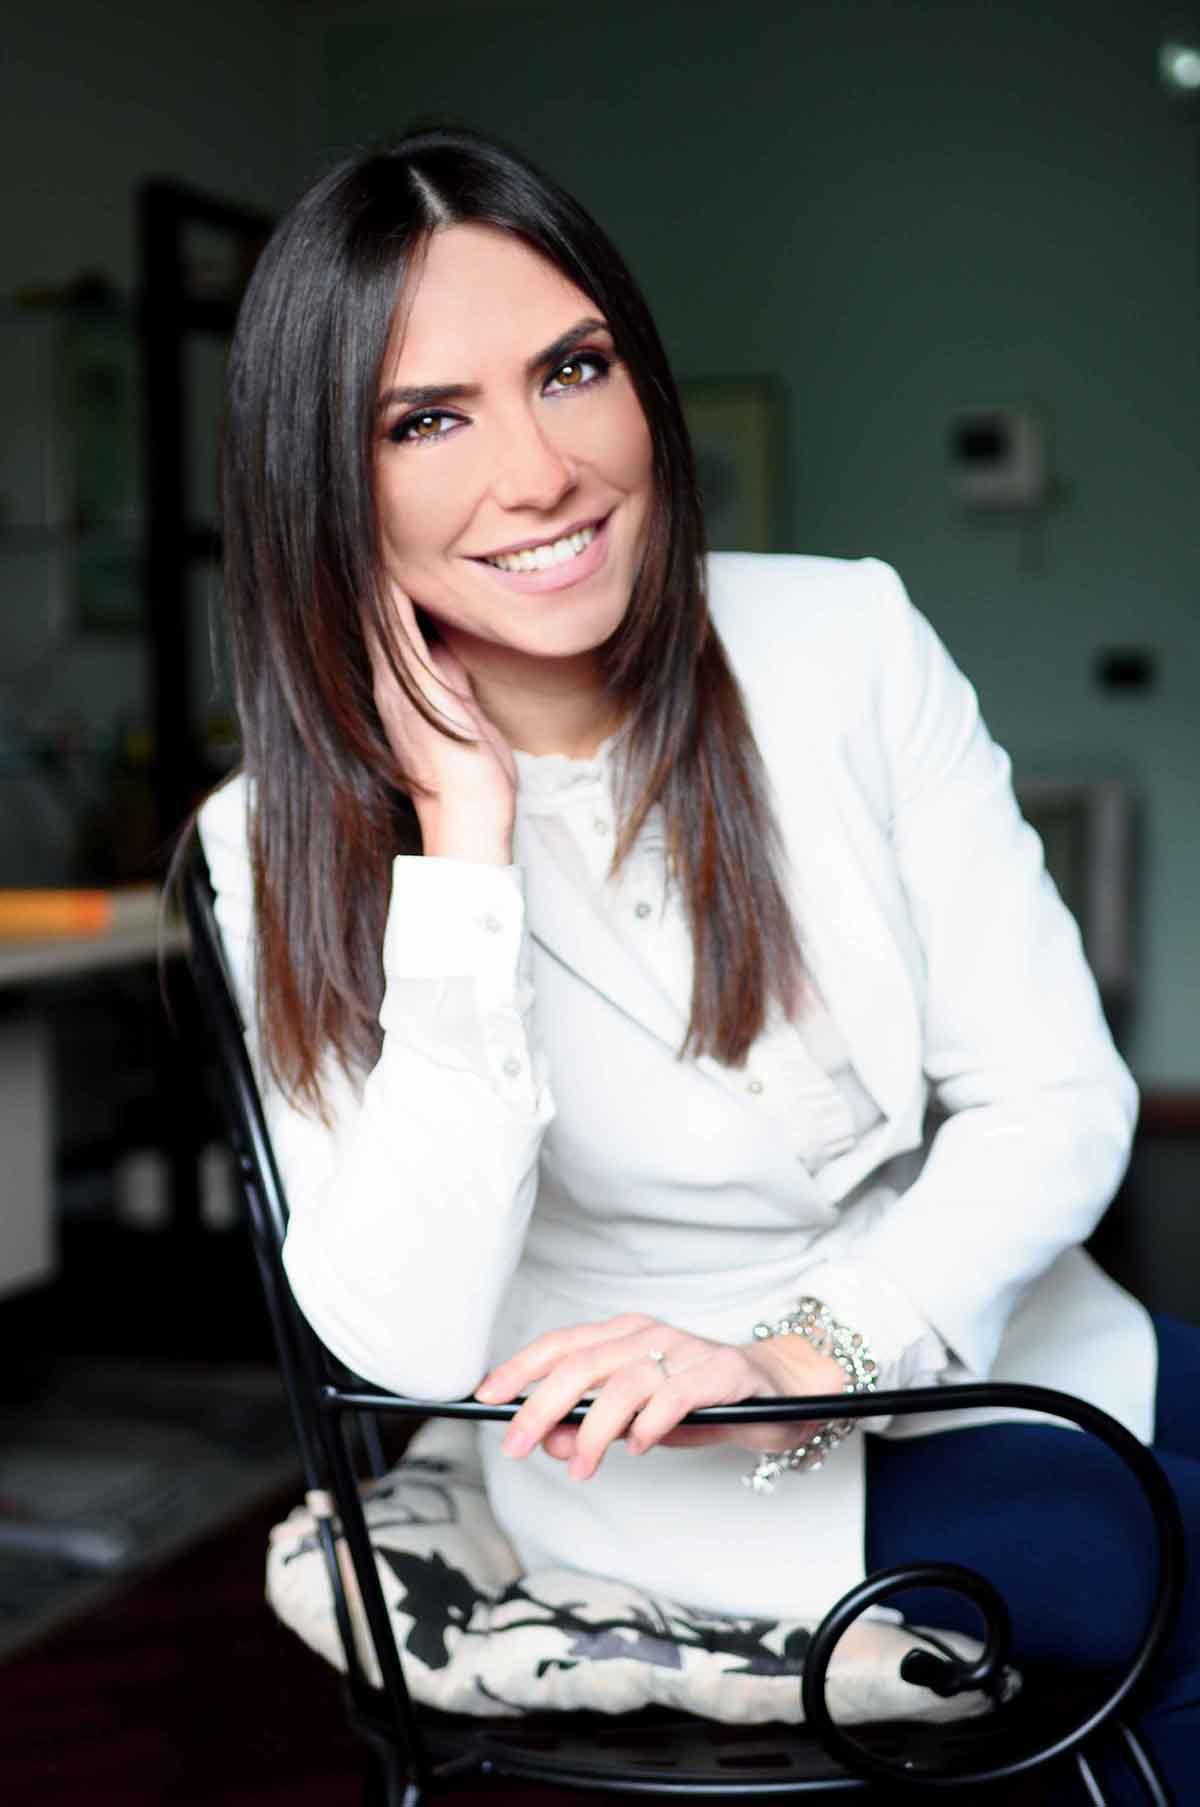 Psicologa Terni Elisa Santarelli